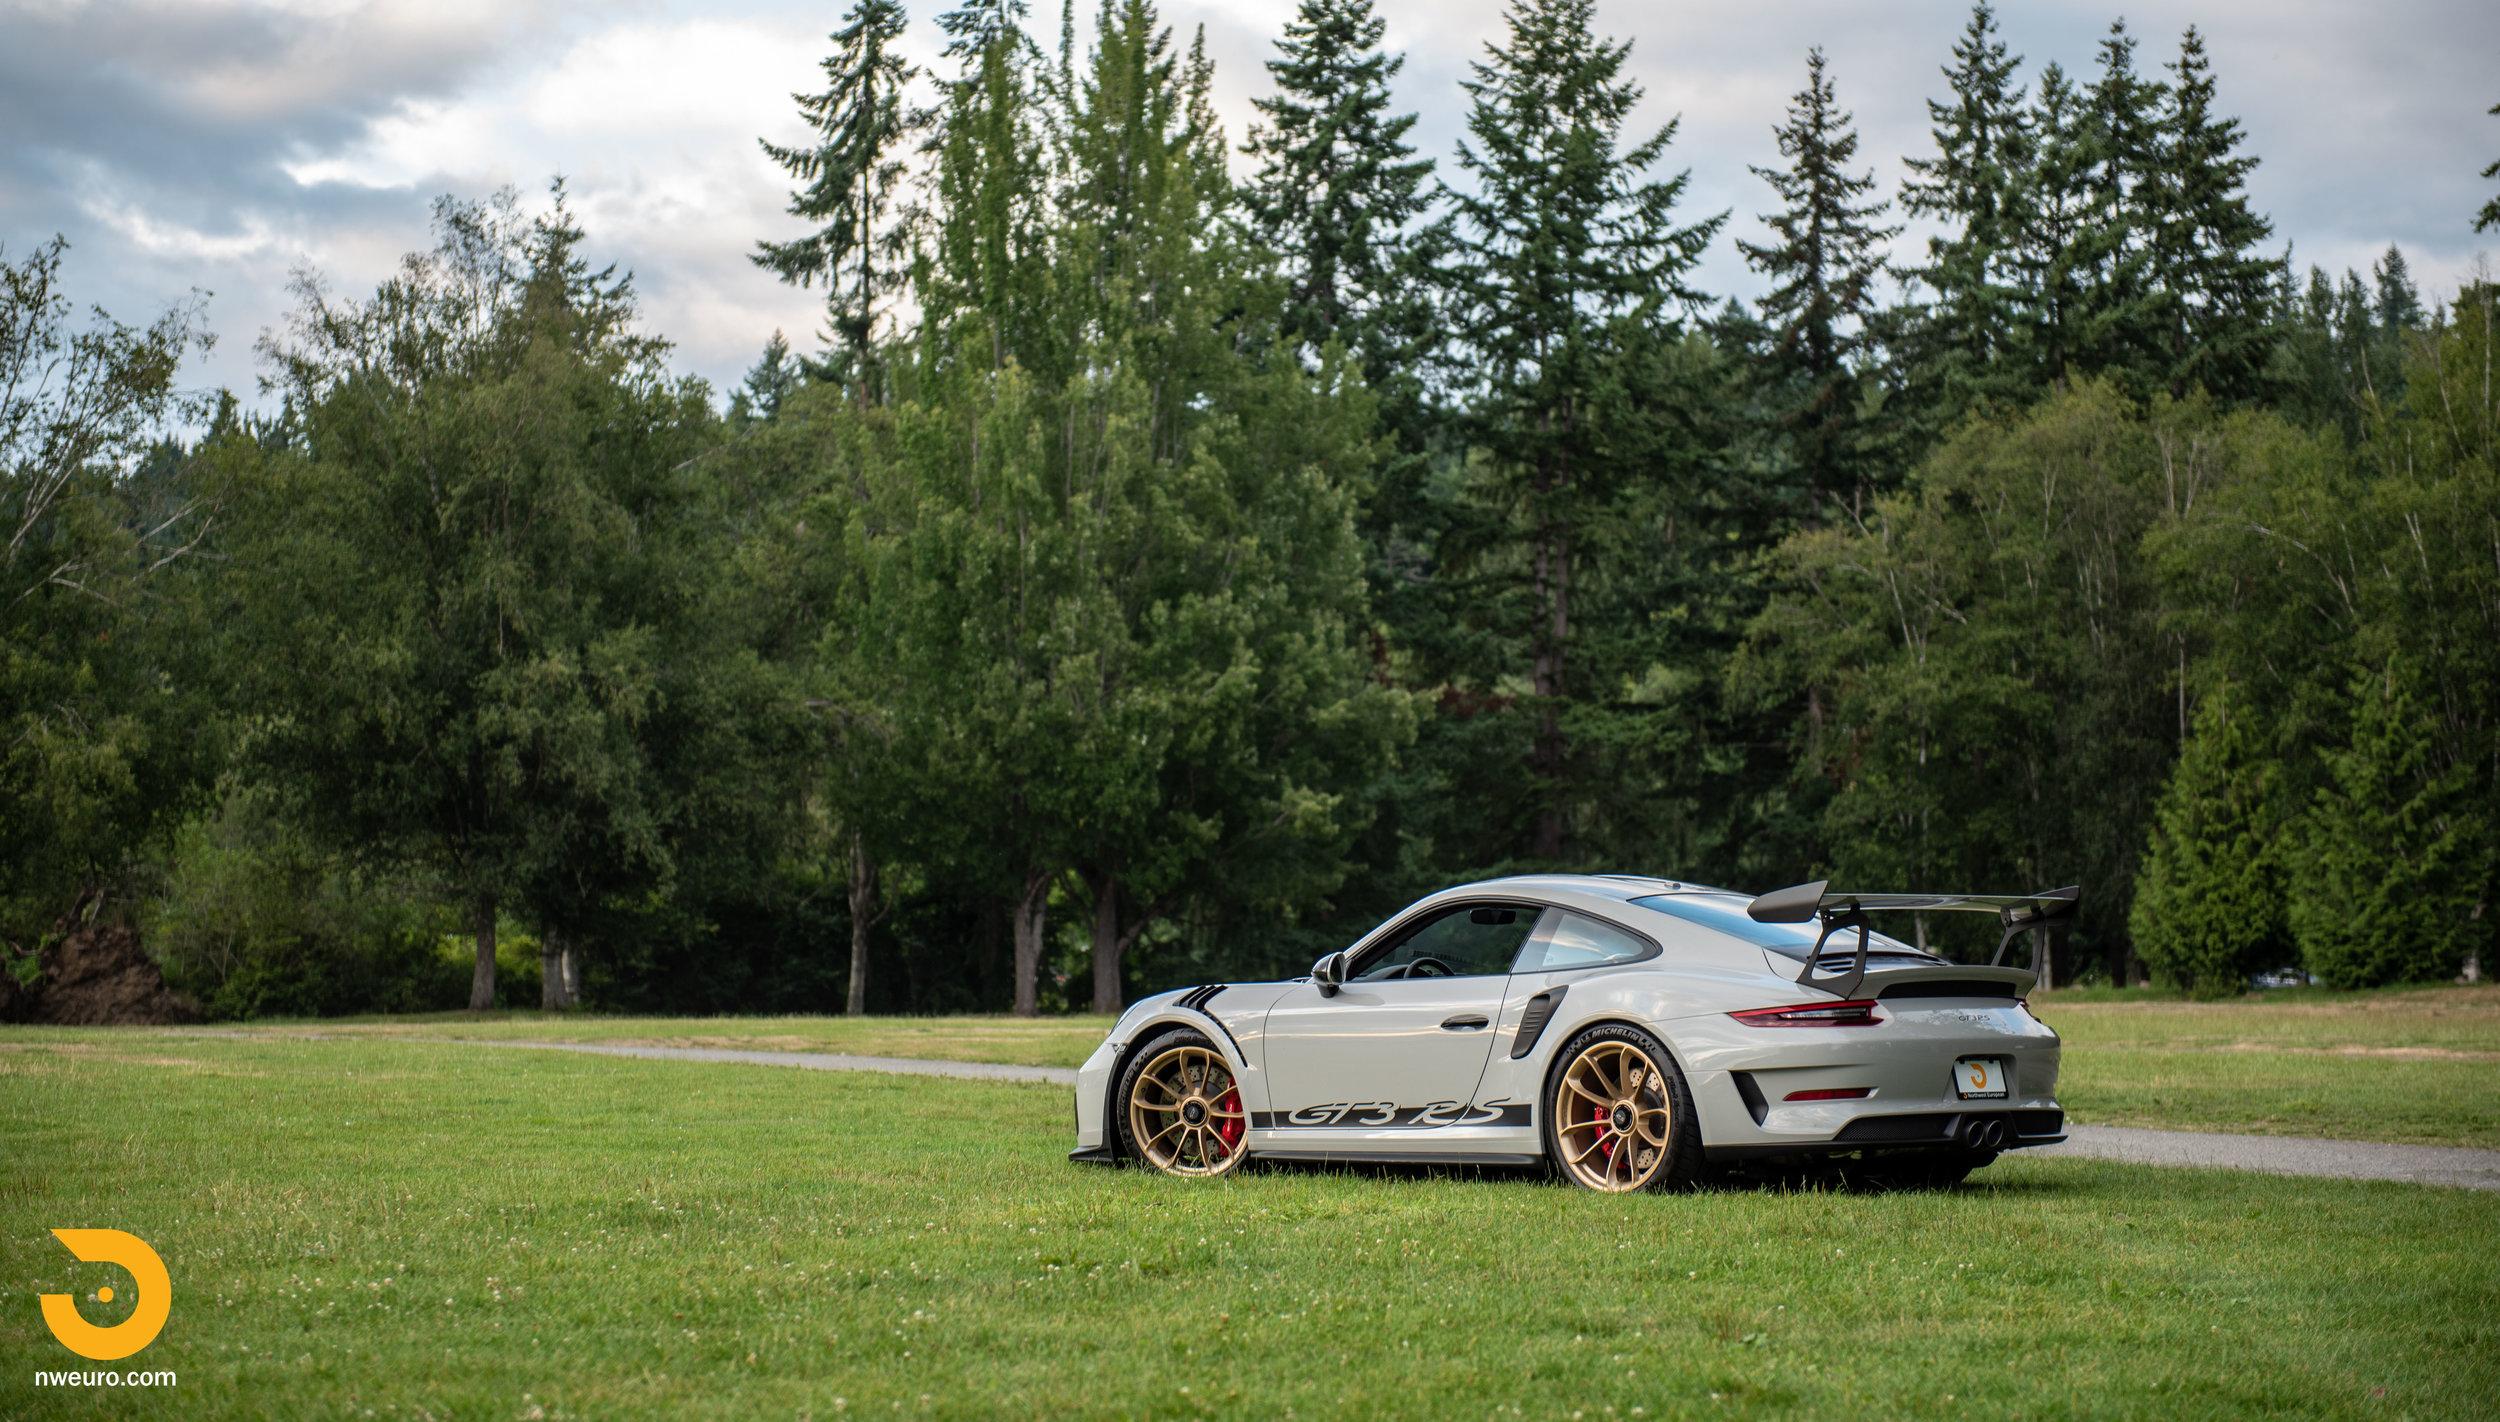 2019 Porsche GT3 RS - Chalk-84.jpg